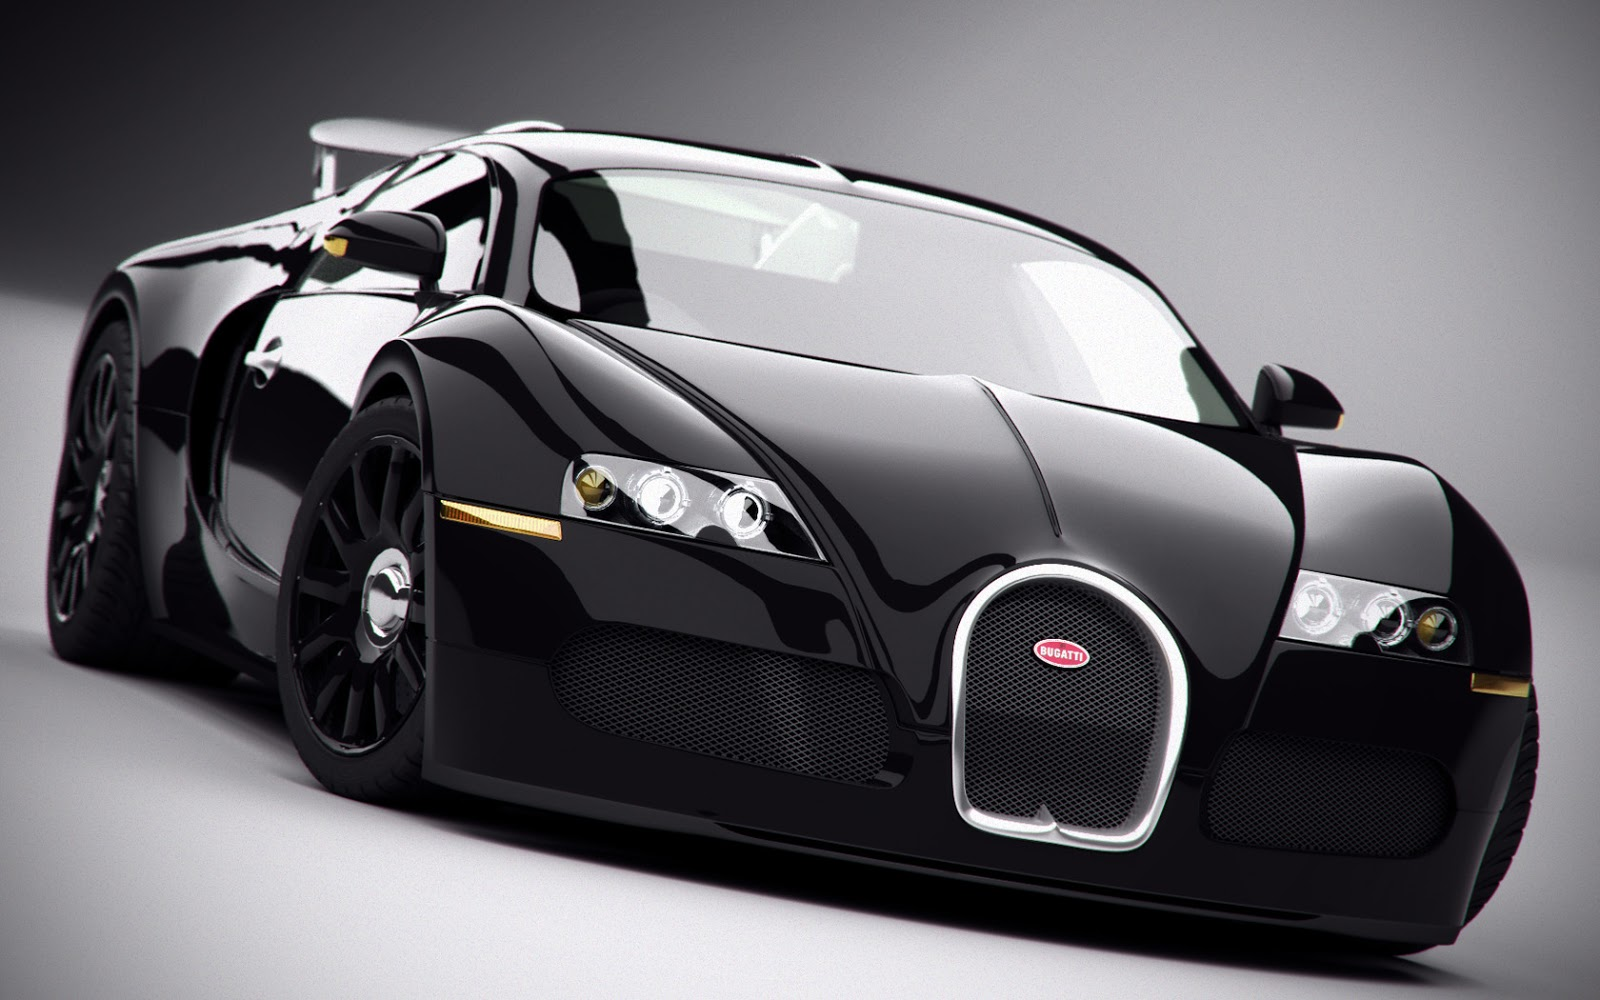 Jaguar Cars Images Free Download free download sports car